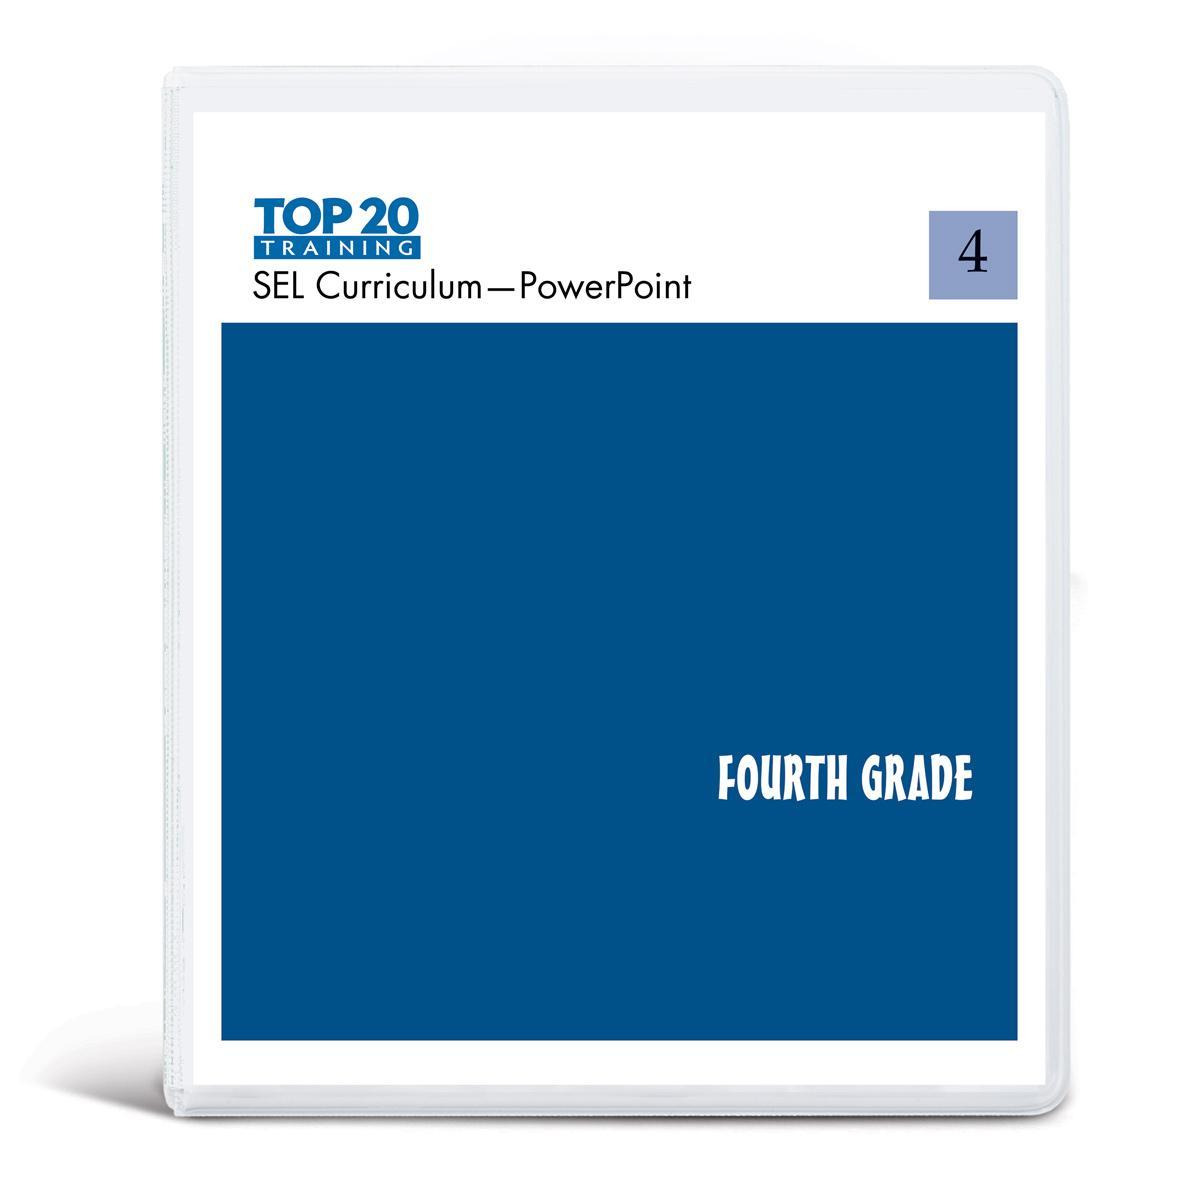 Top 20 teachers PowerPoint curriculum for fourth grade